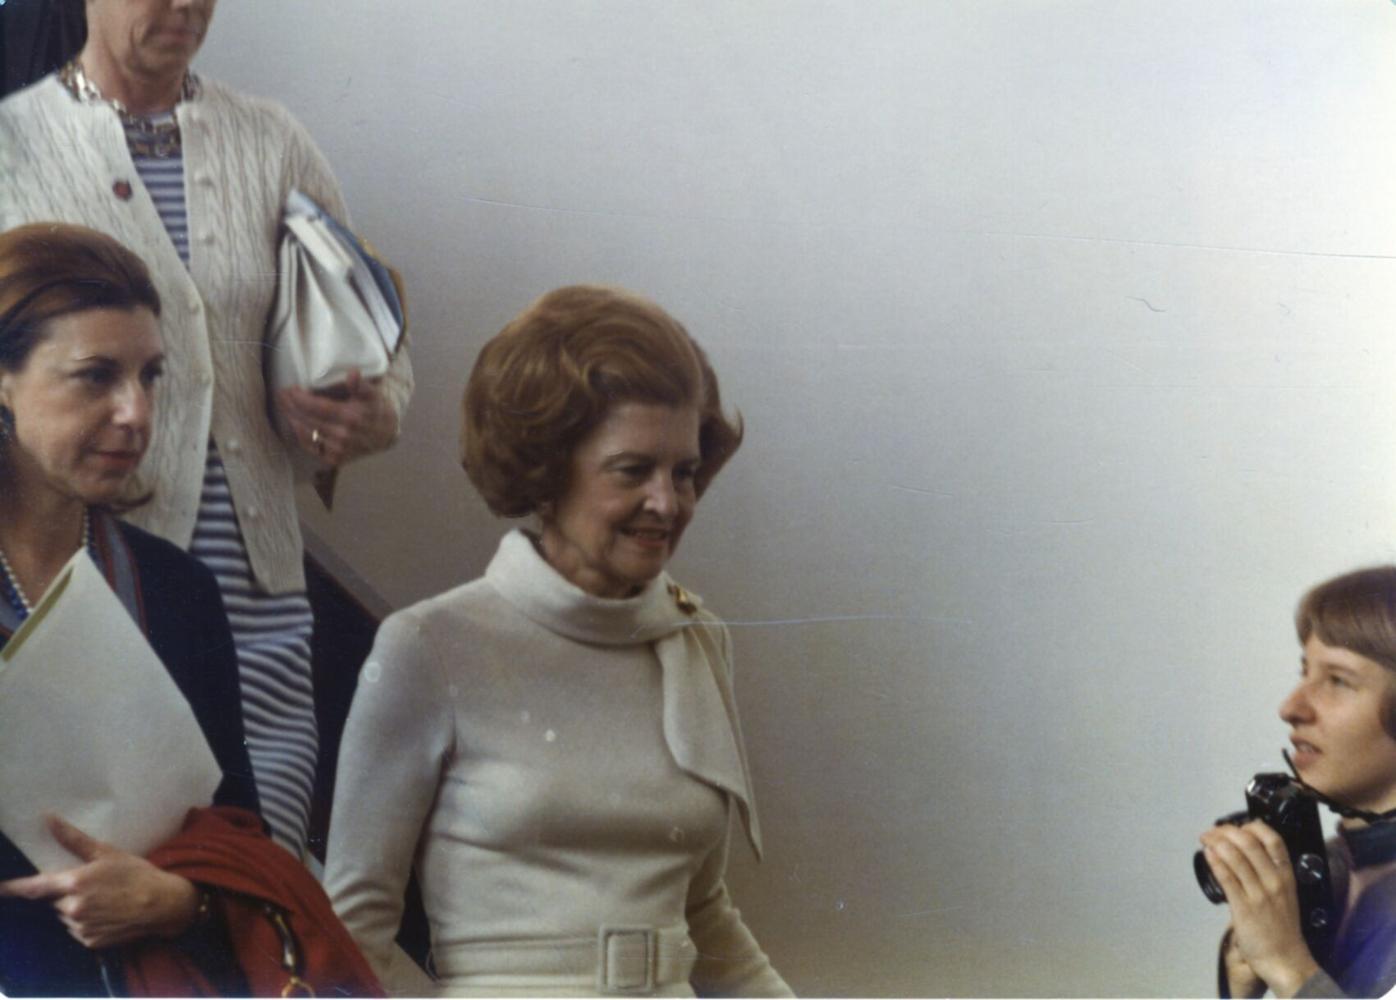 Helen Frankenthaler and Betty Ford